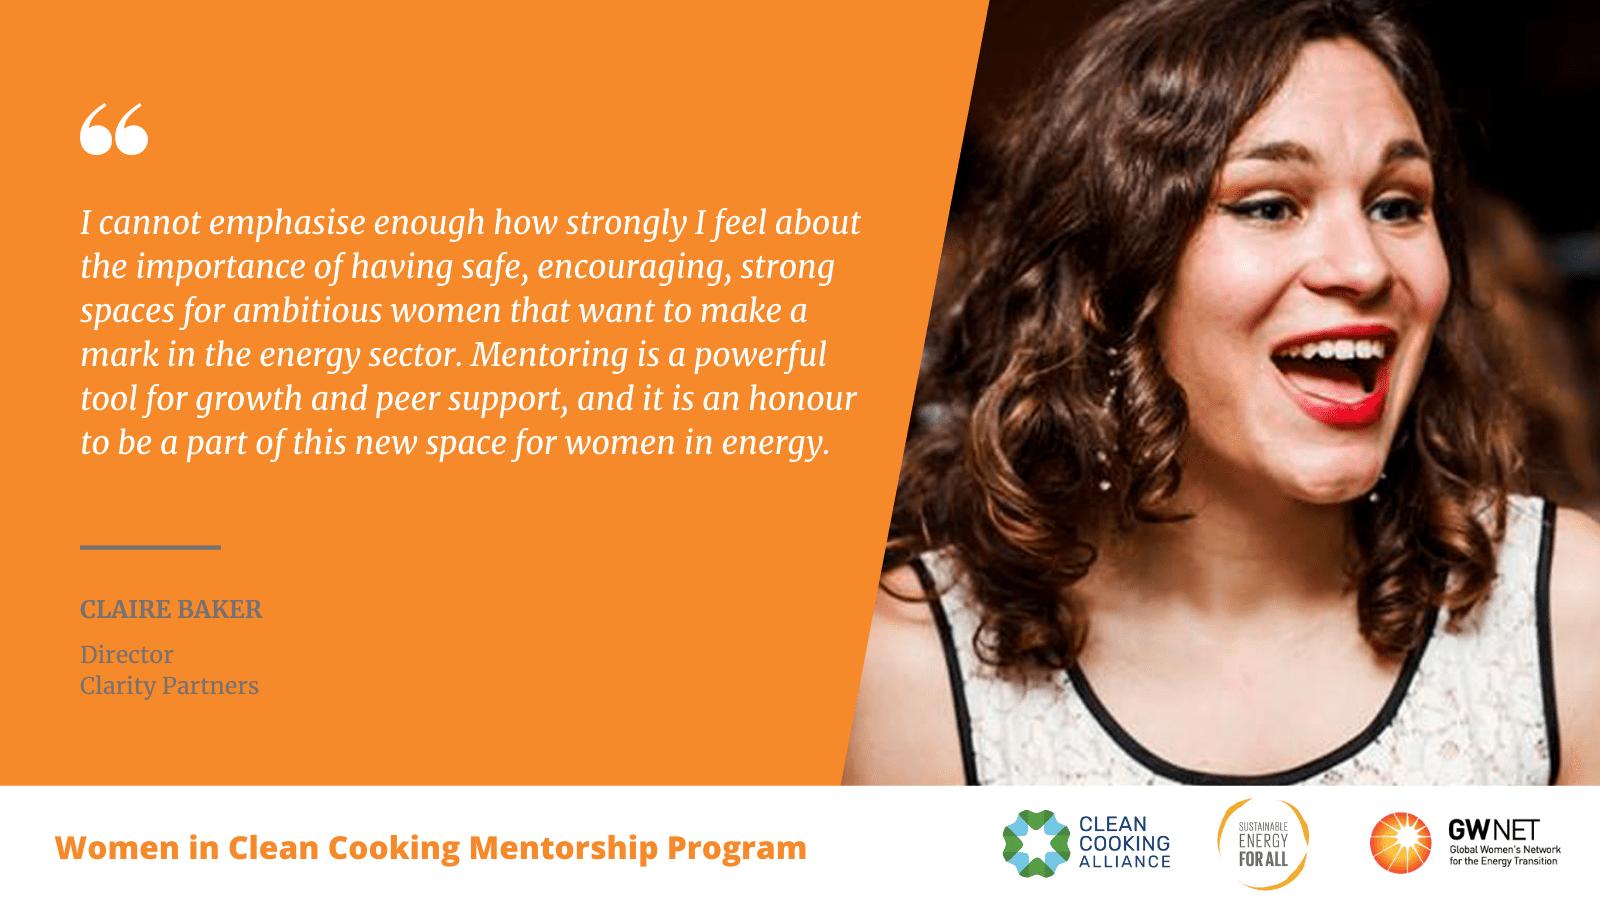 Claire Baker Women in Clean Cooking Mentorship Program